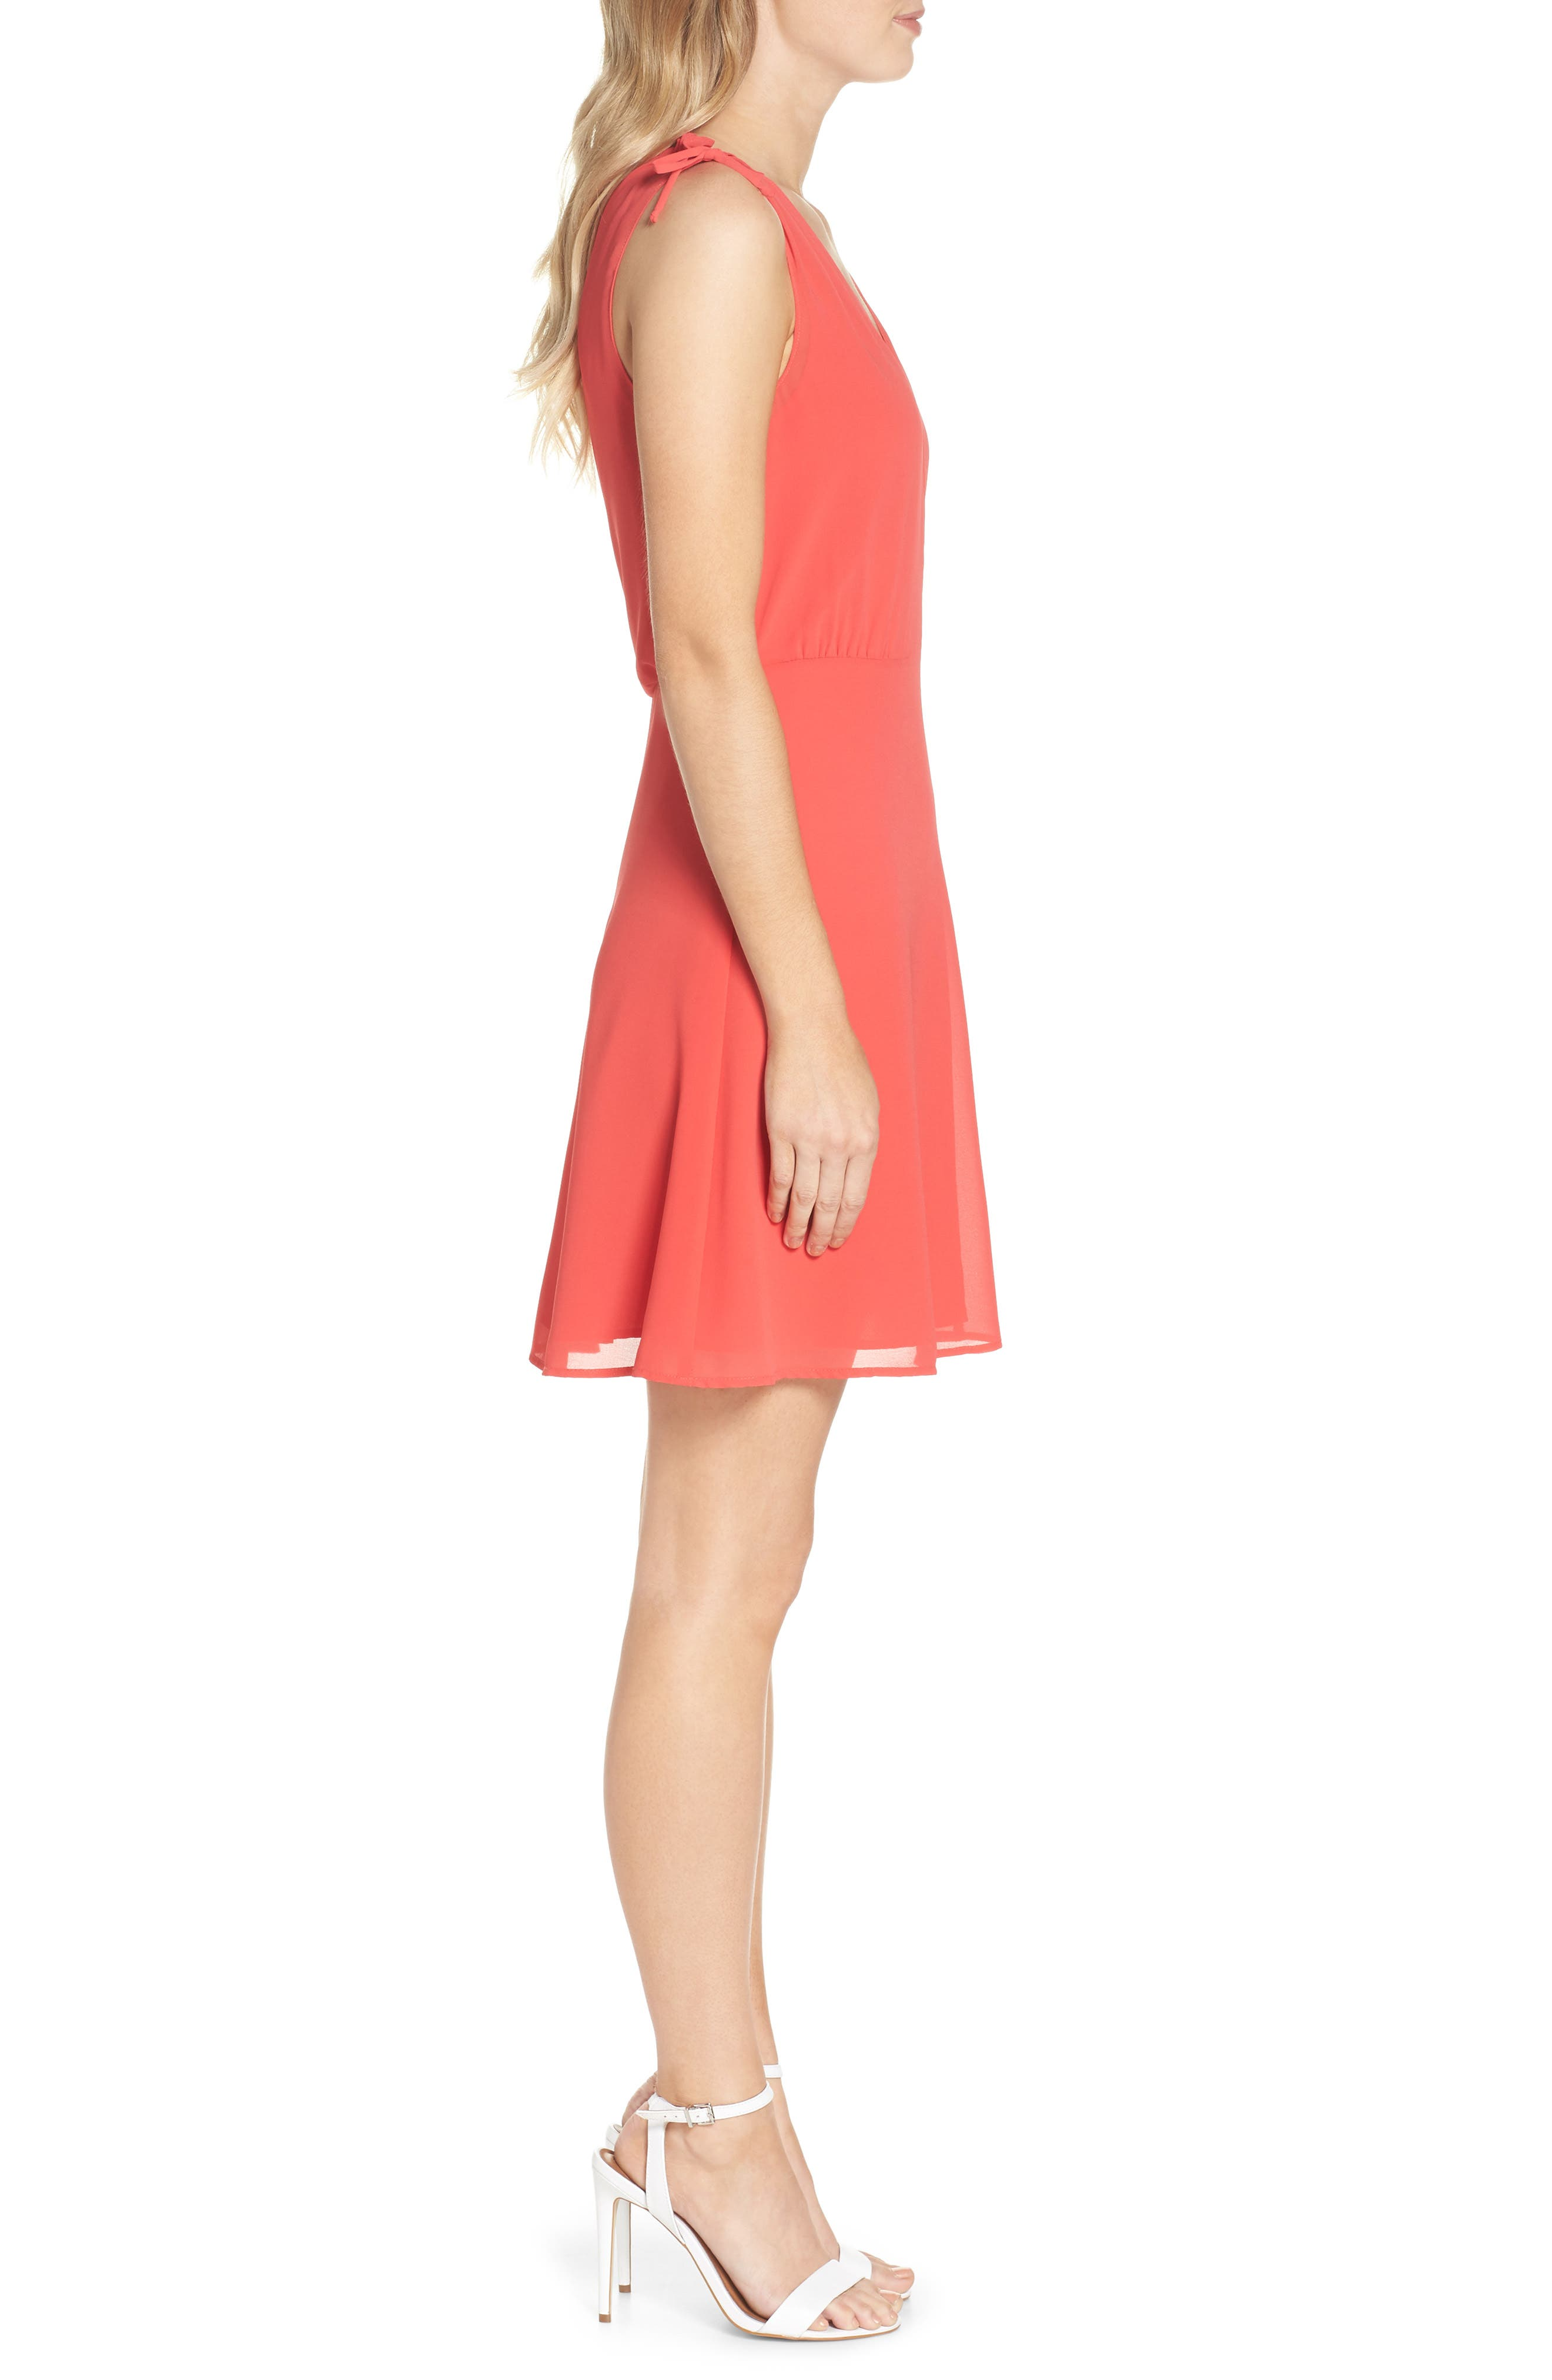 Soufflé V-Neck Chiffon Dress,                             Alternate thumbnail 3, color,                             Strawberry